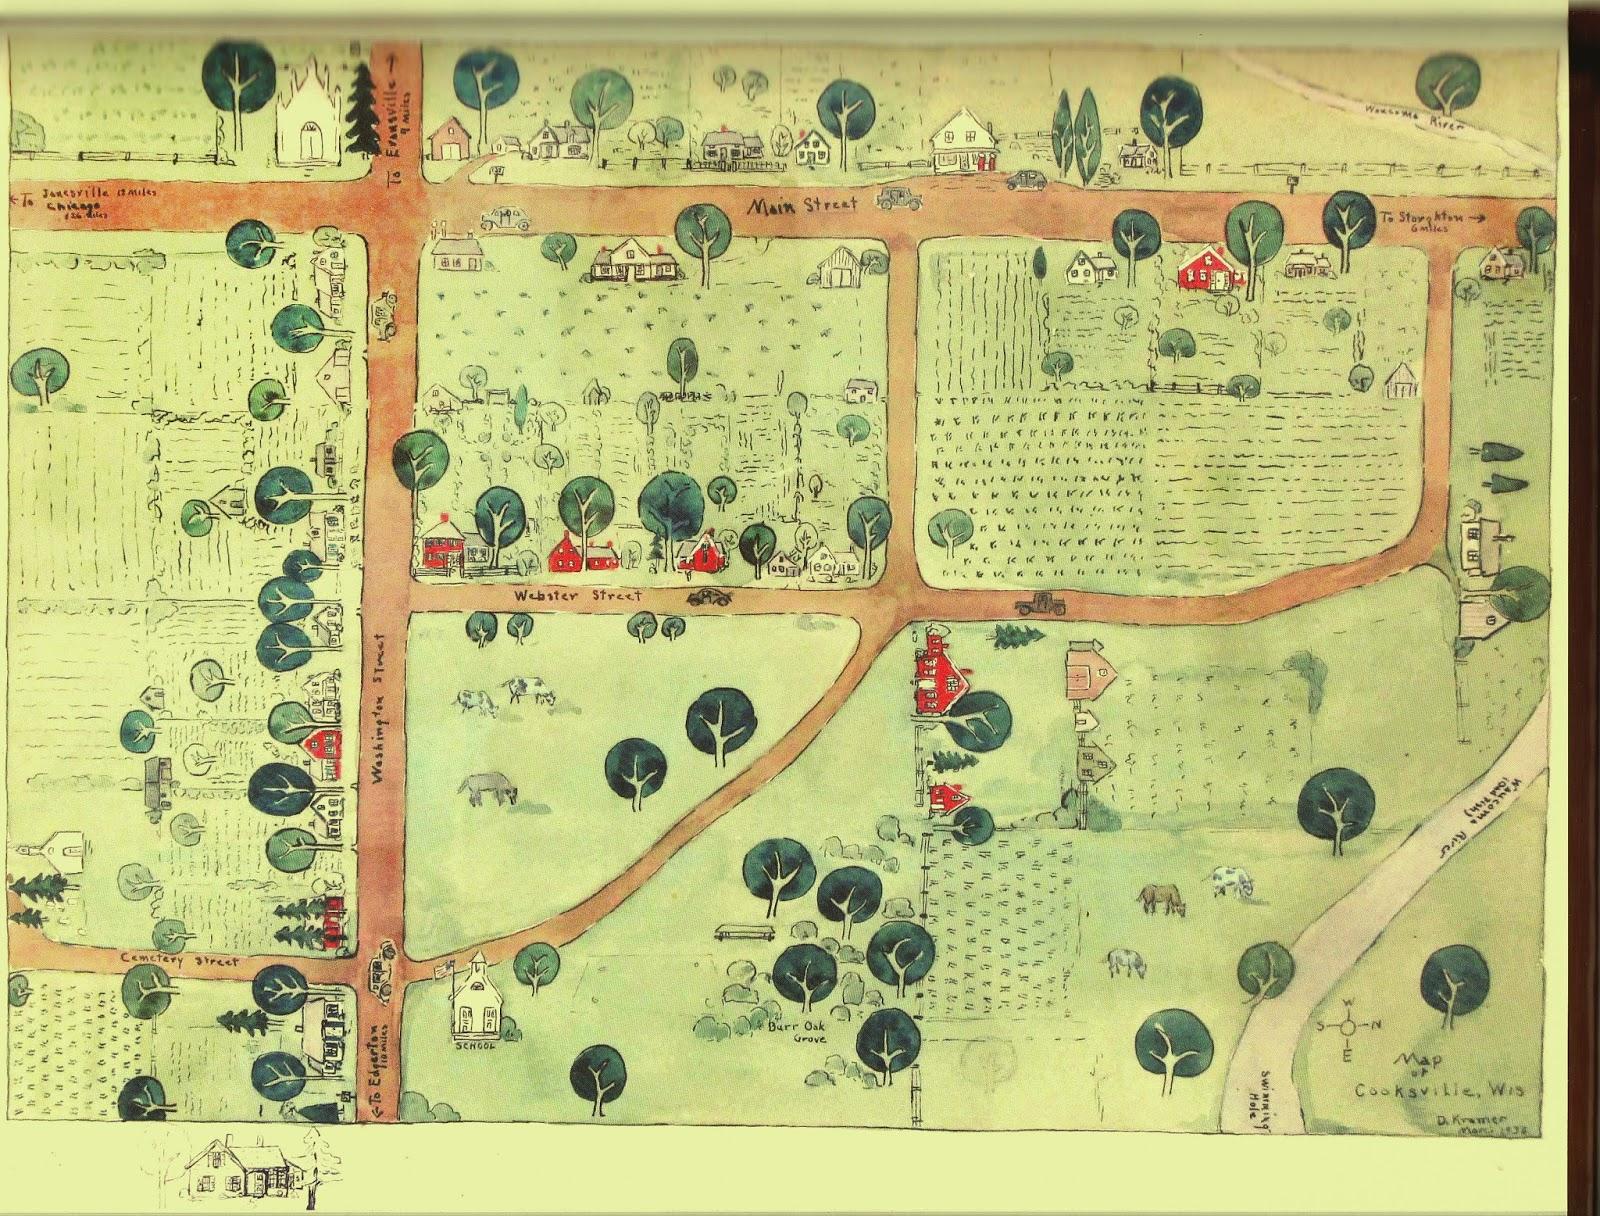 map of cooksville by dorothy kramer 1938